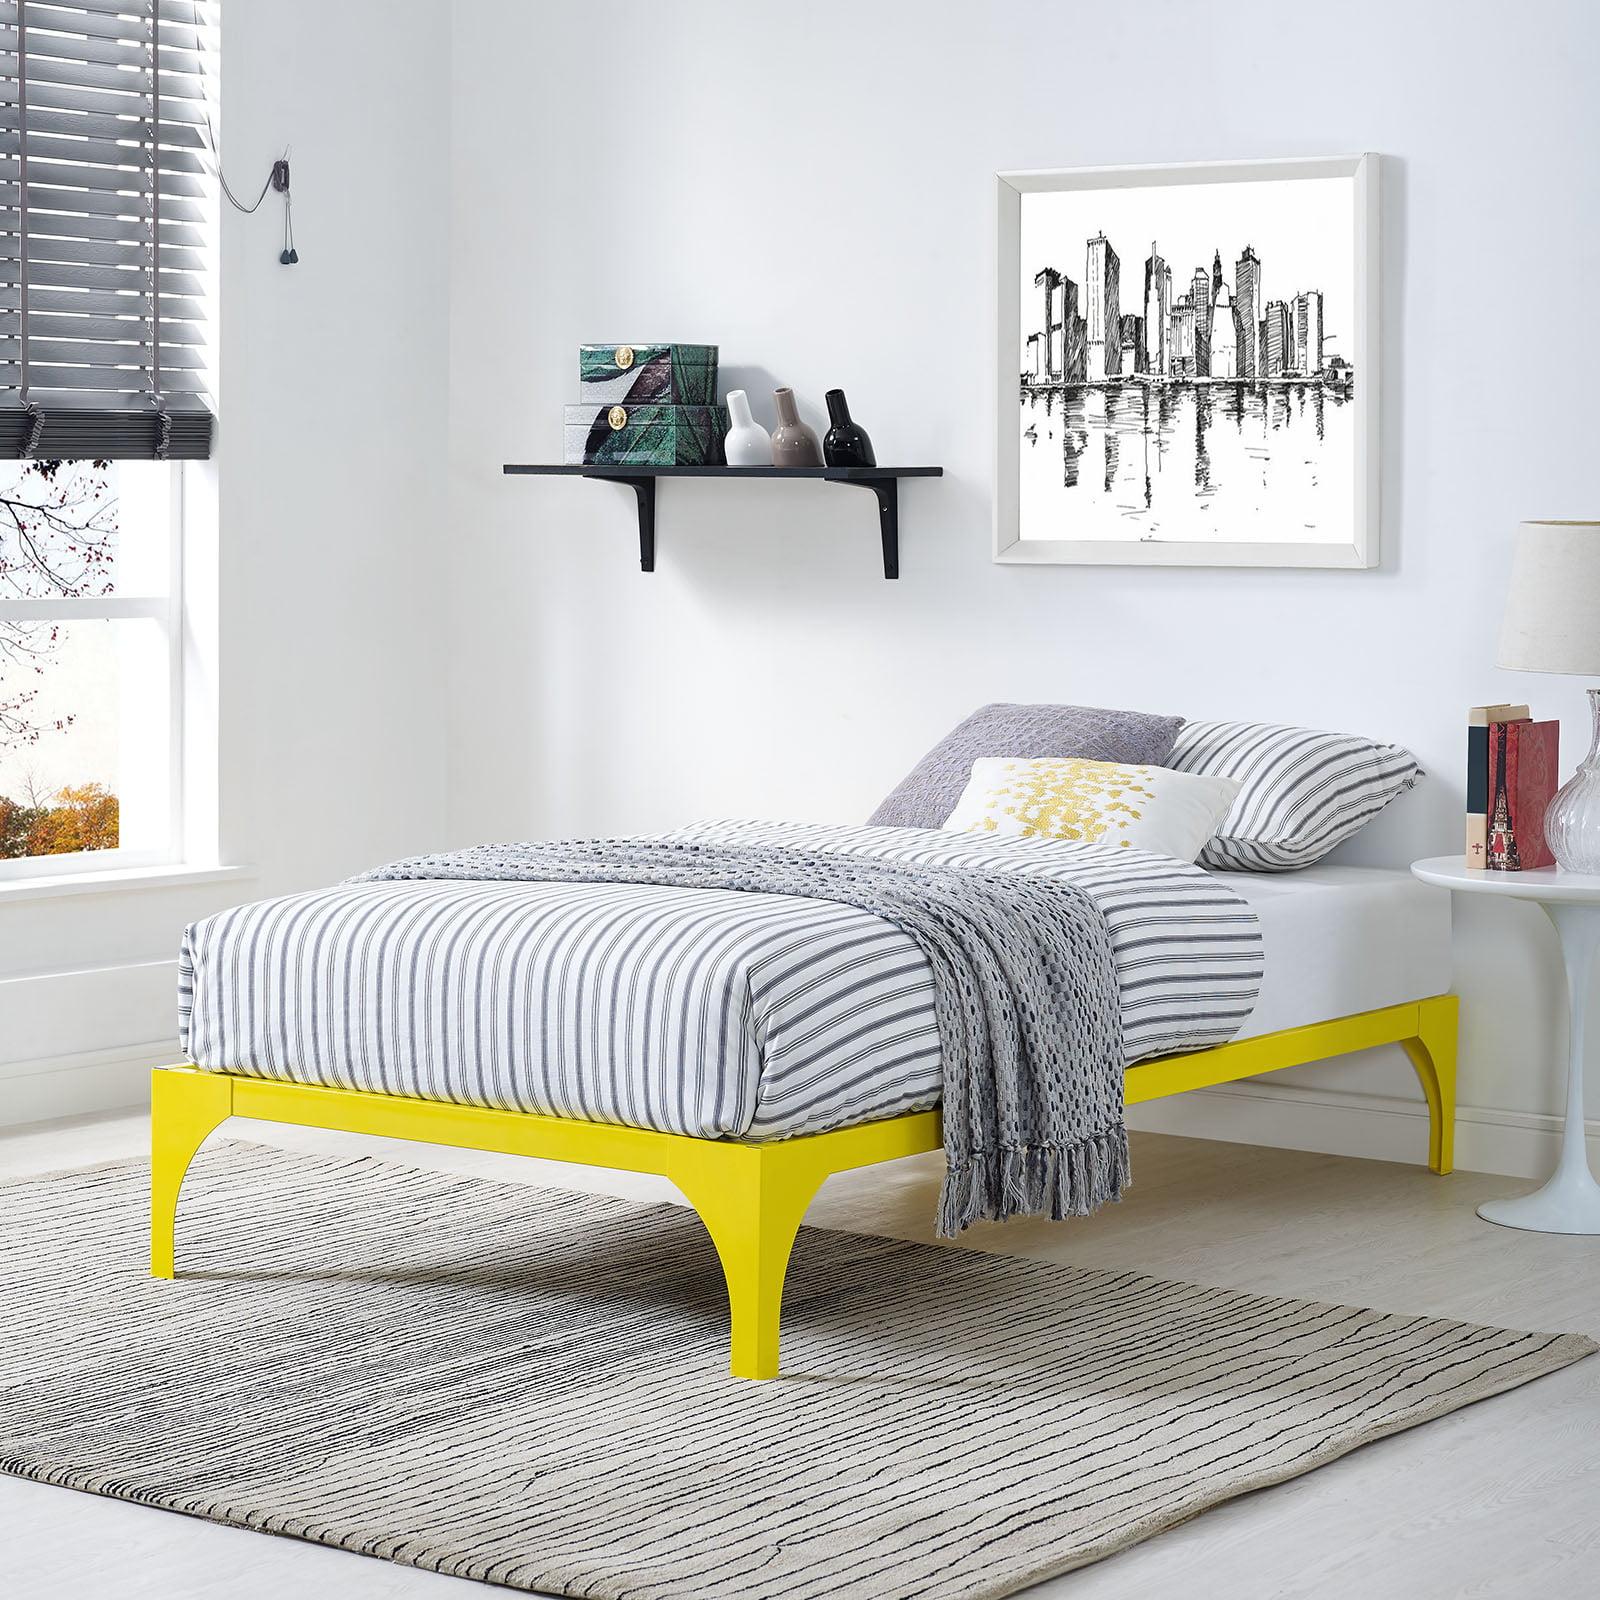 Modway Ollie Steel Platform Bed Frame, Multiple Sizes and Colors